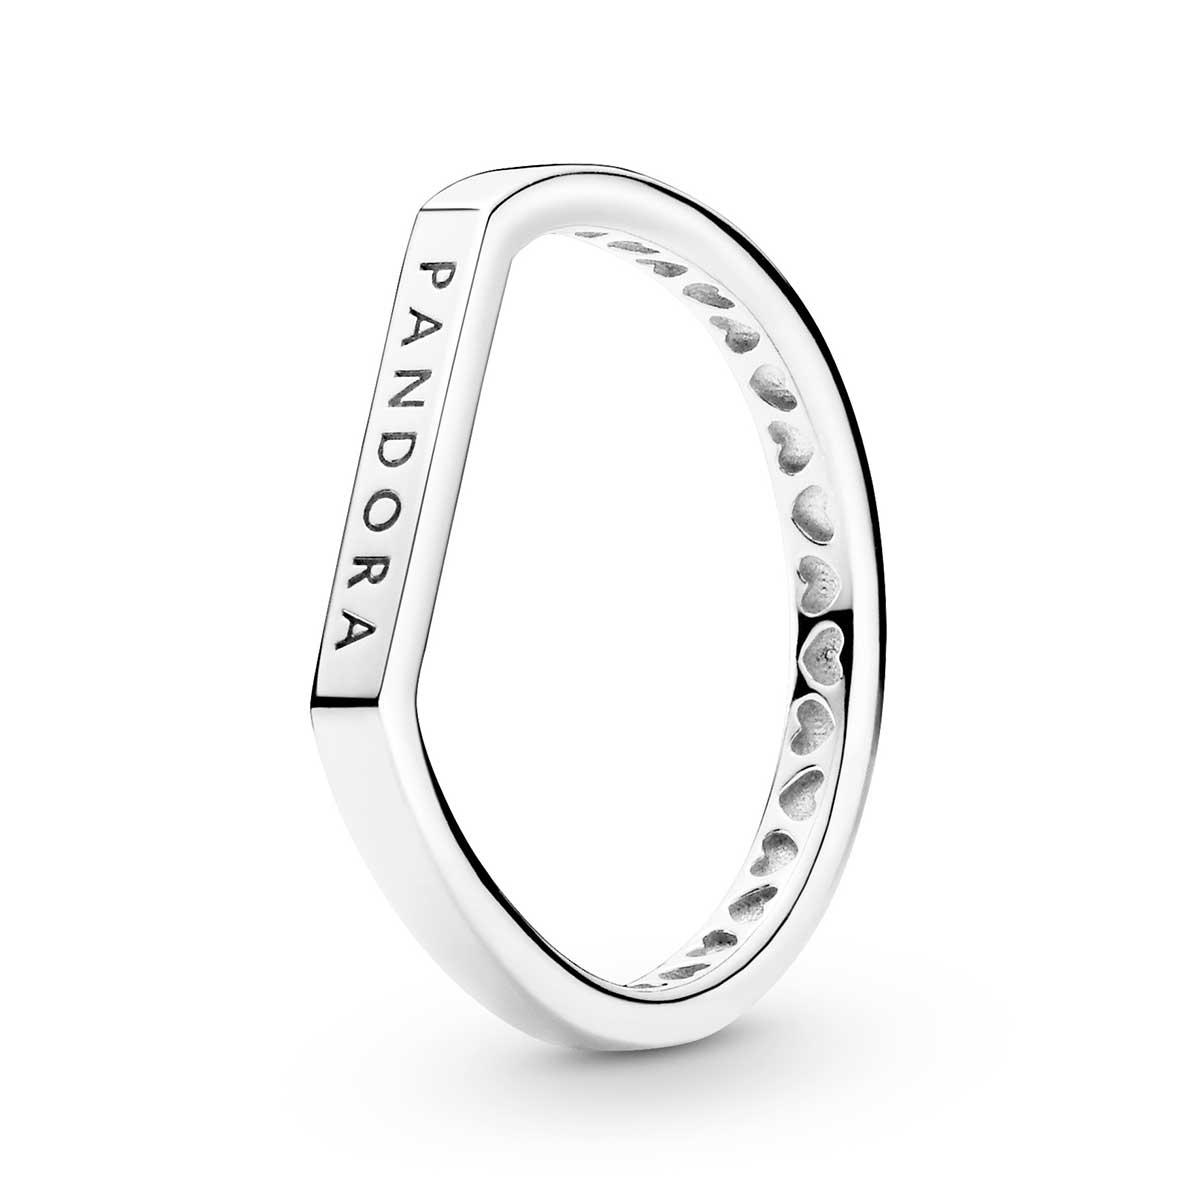 pandora logo bar stacking ring precious accents ltd pandora logo bar stacking ring